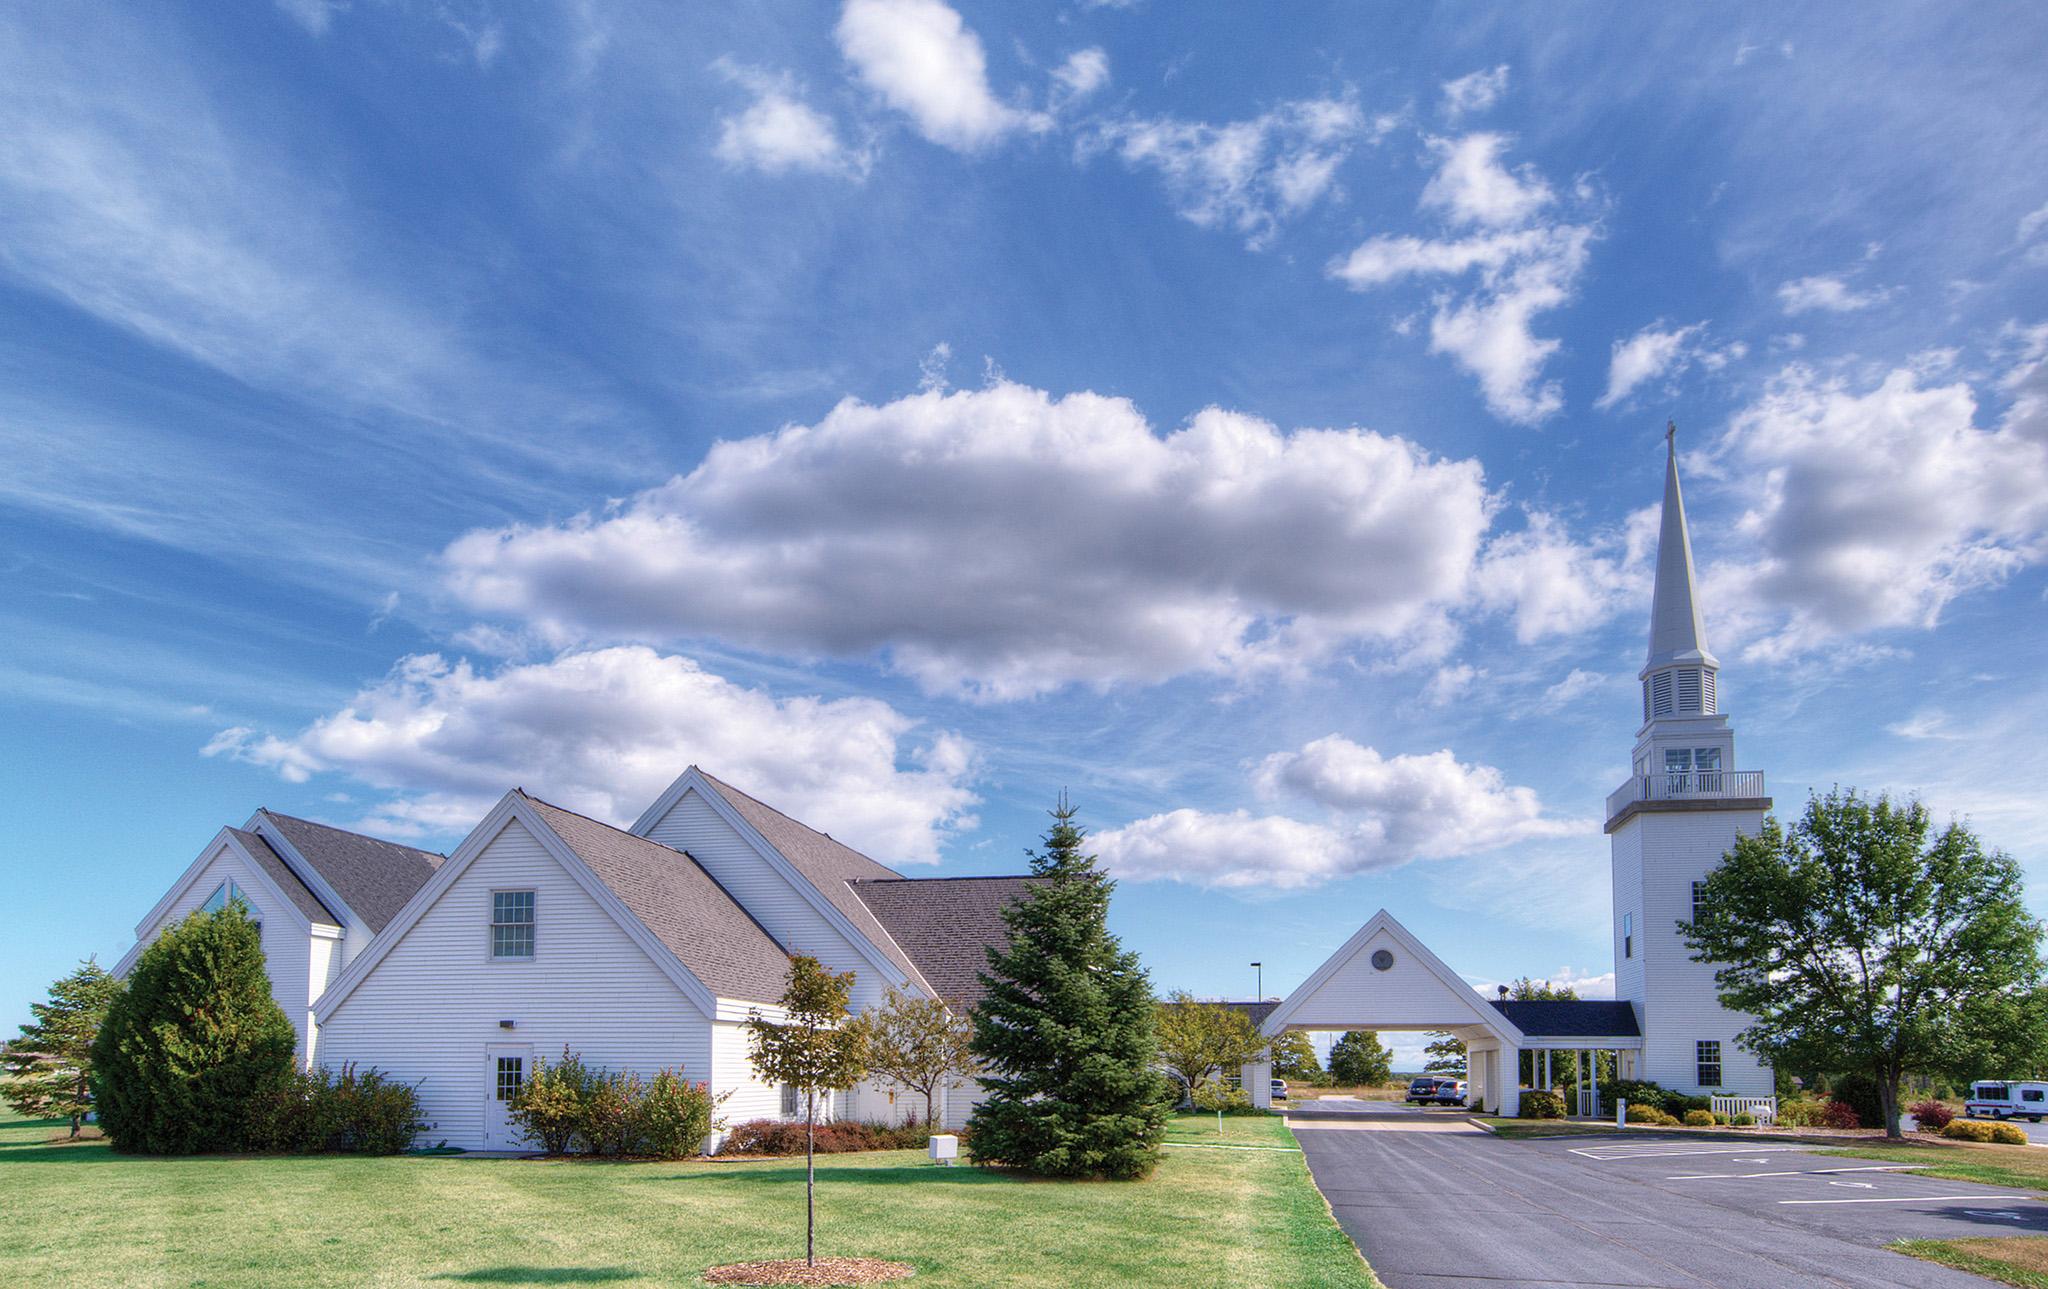 1_Shepherd of the Bay Lutheran Church